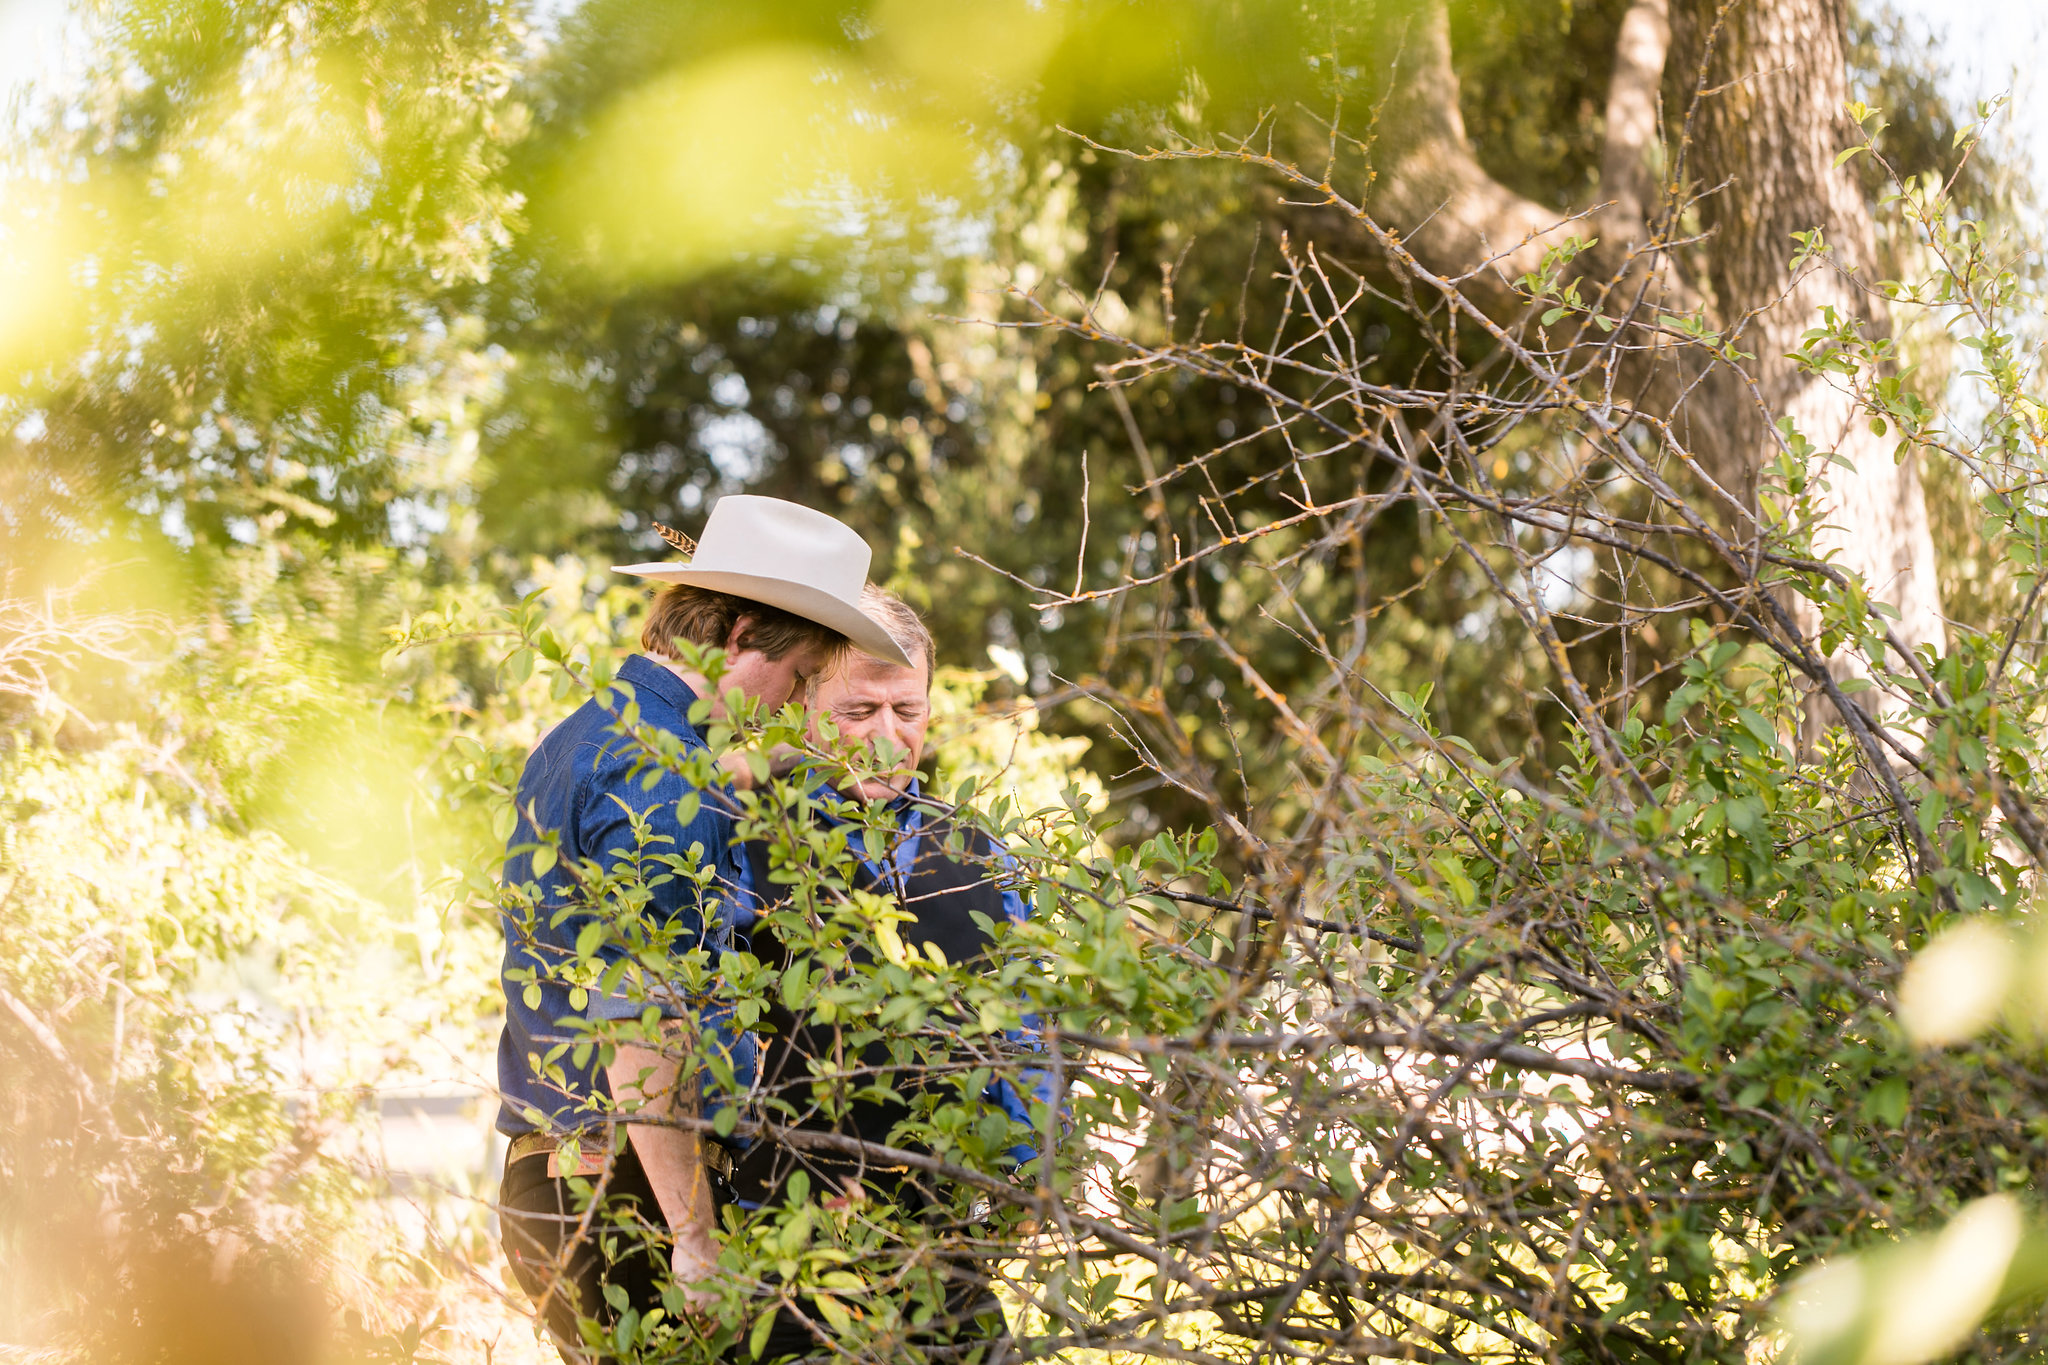 cameron_ingalls-santa_margarita_ranch-clark-0274.jpg